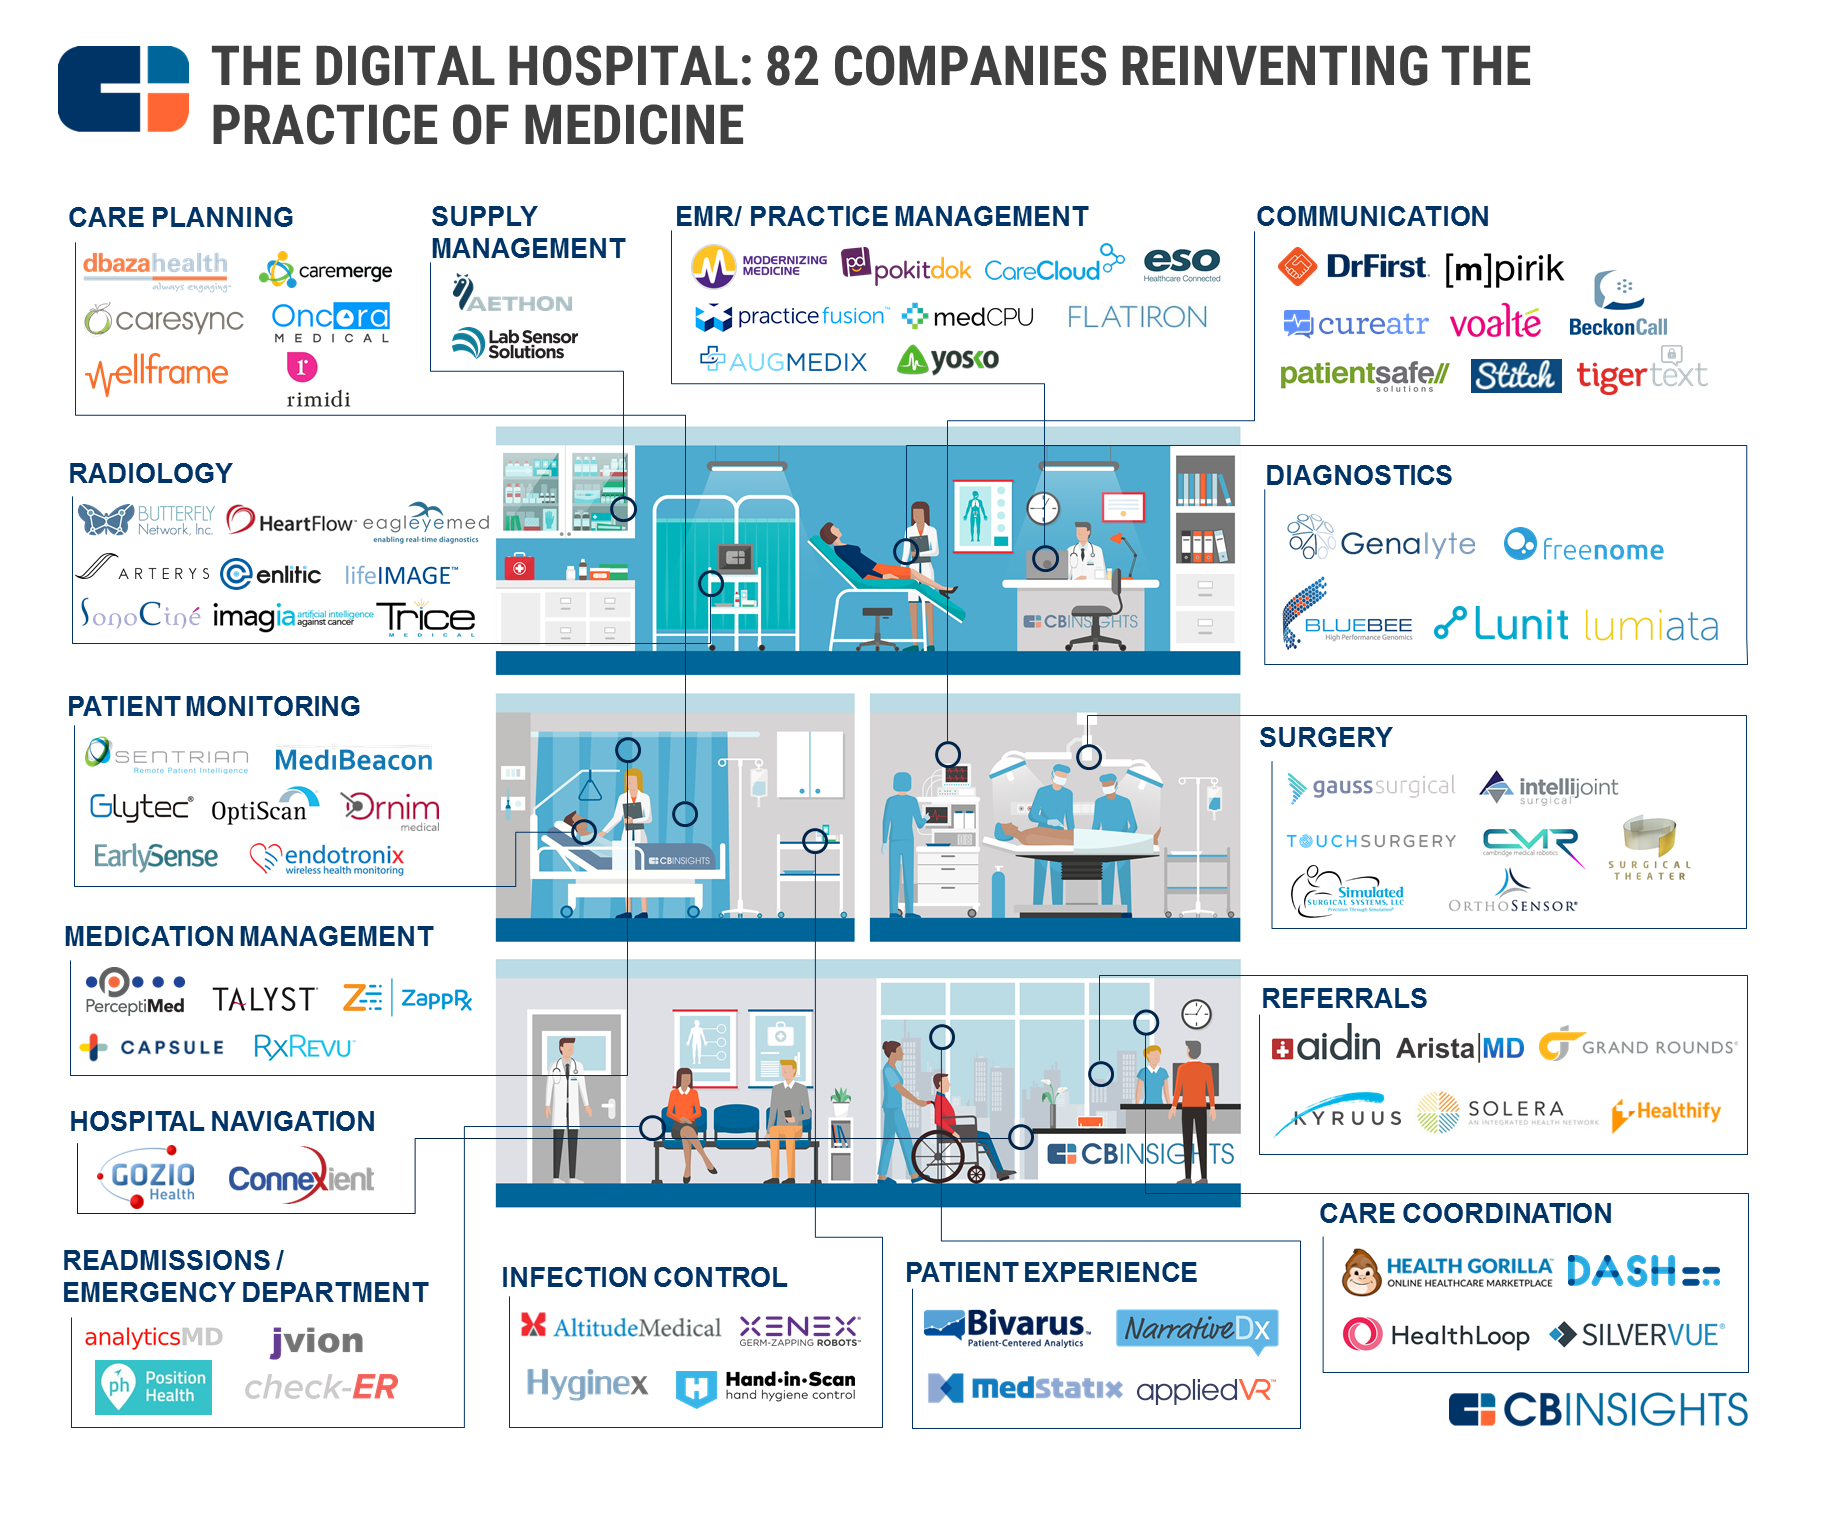 Companies reinventing the practice of medicine